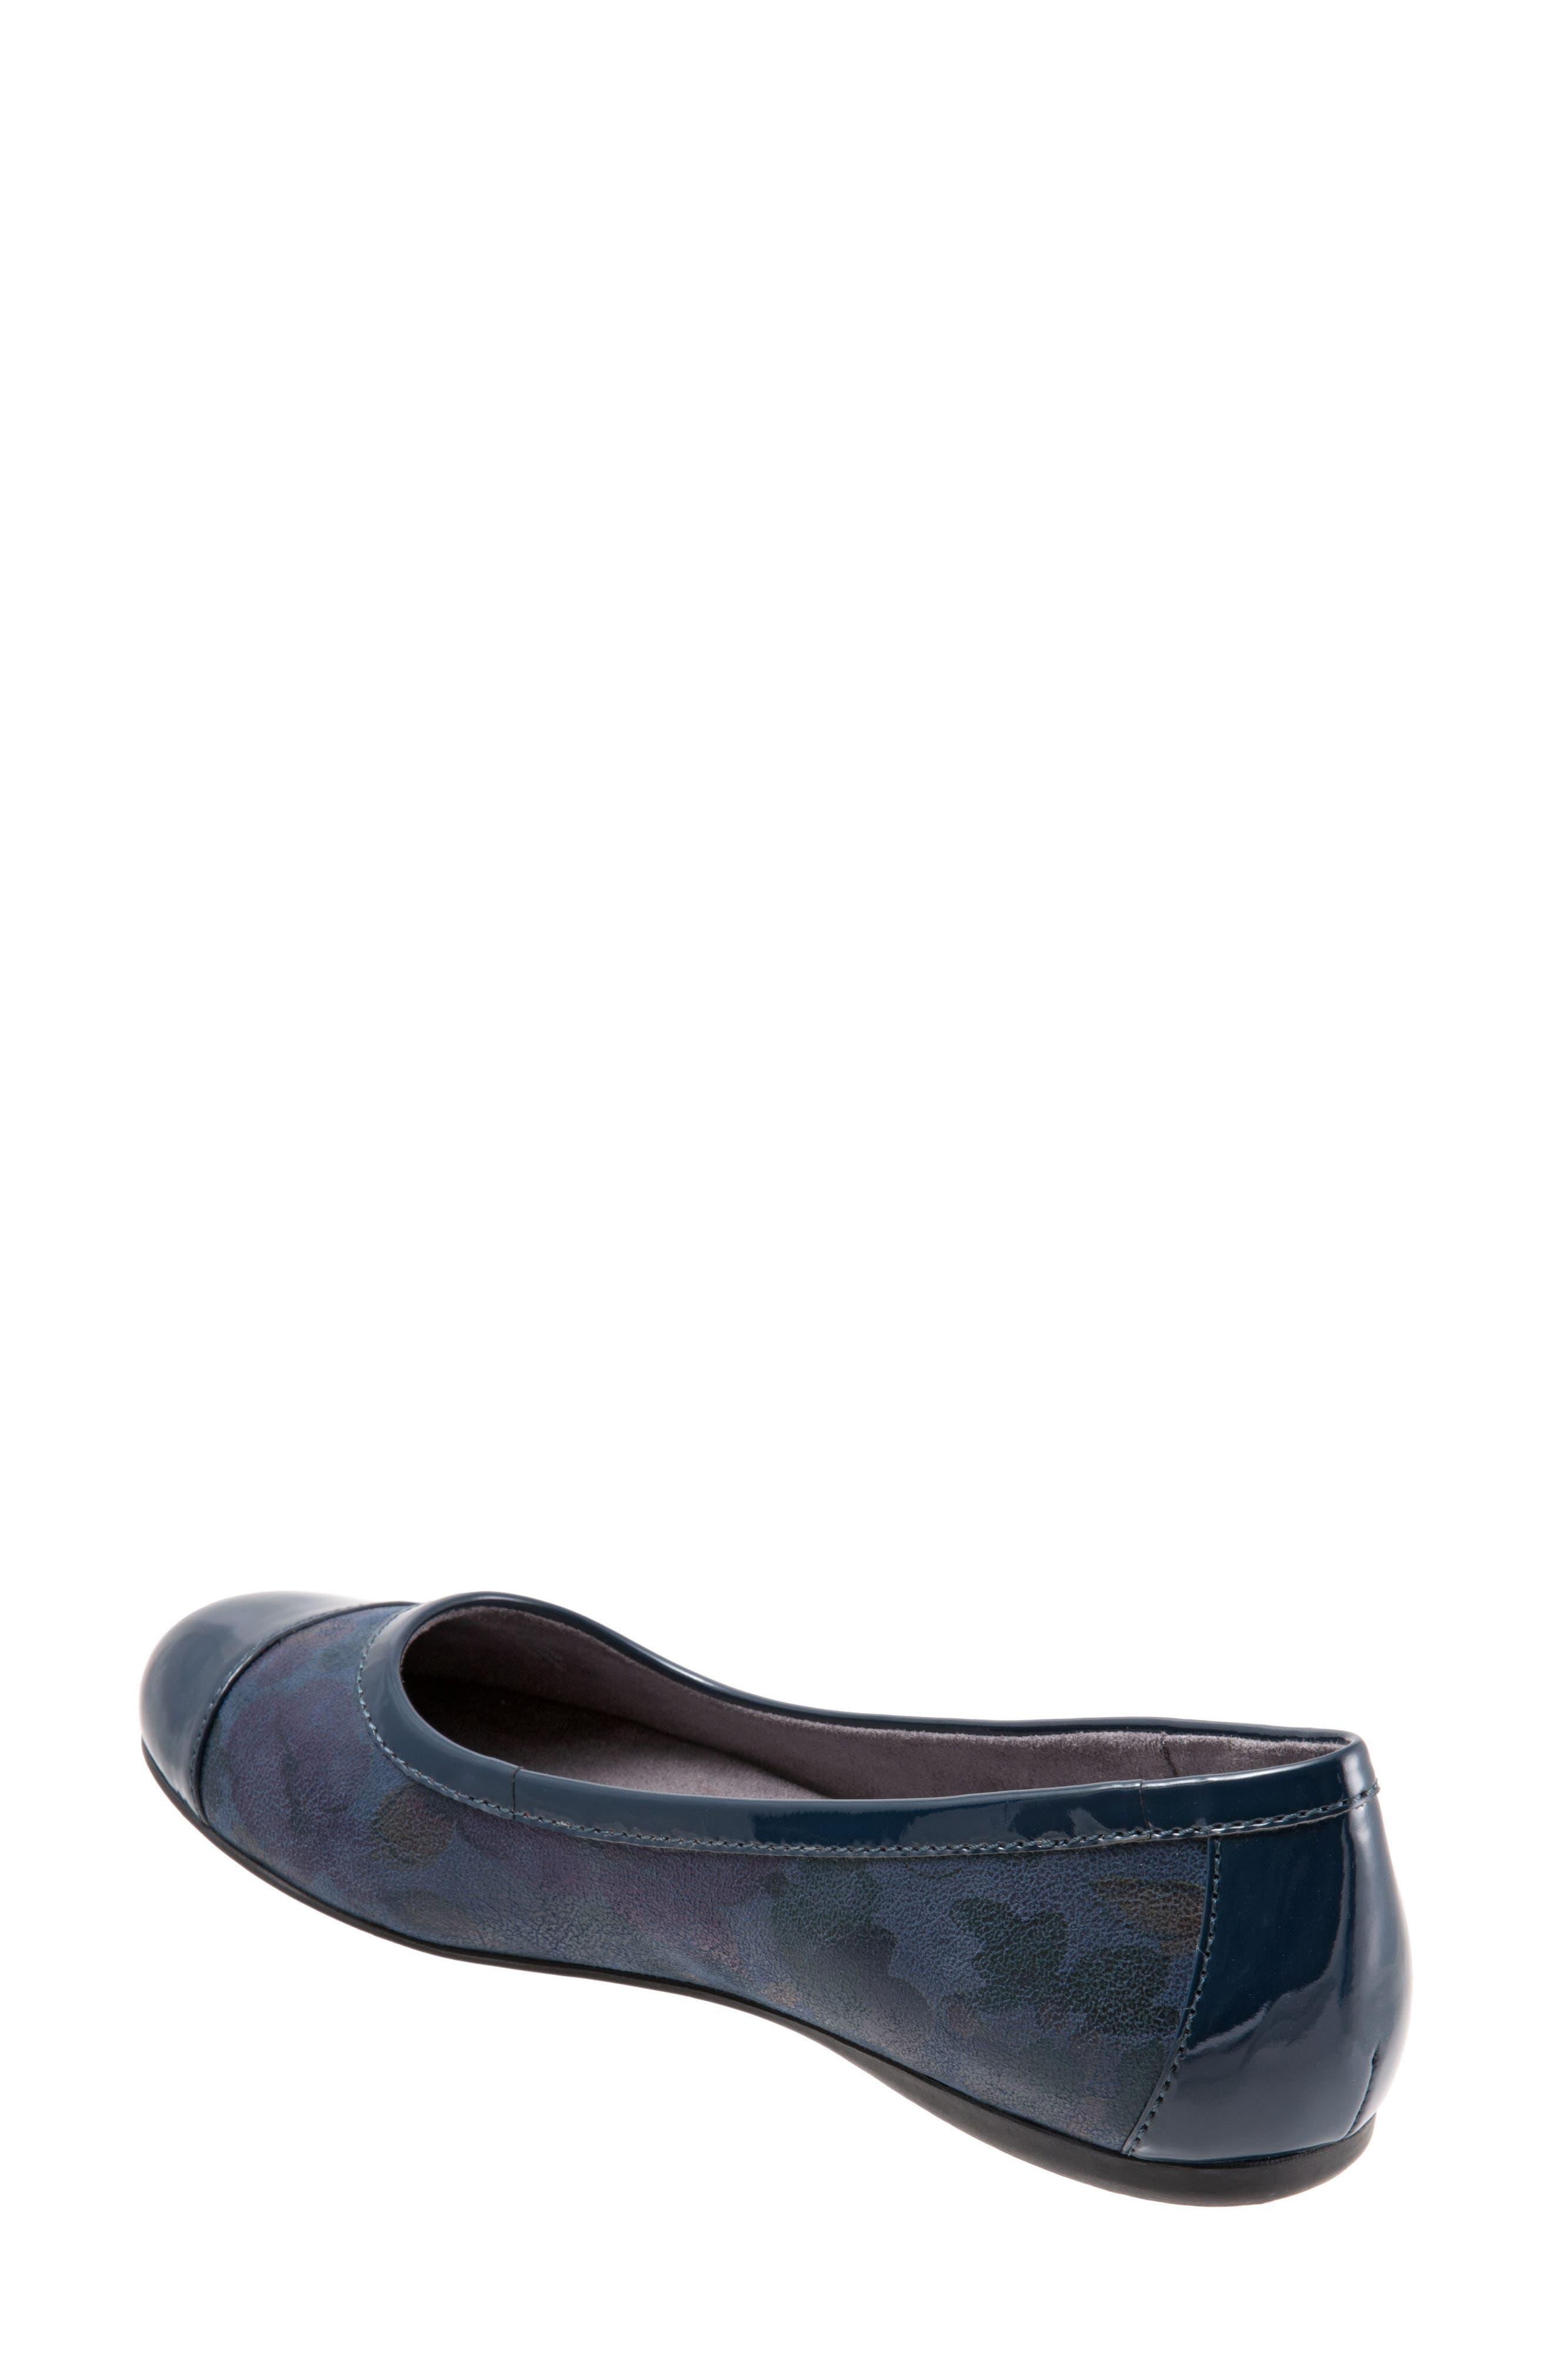 'Napa' Flat,                             Alternate thumbnail 2, color,                             Navy Leather